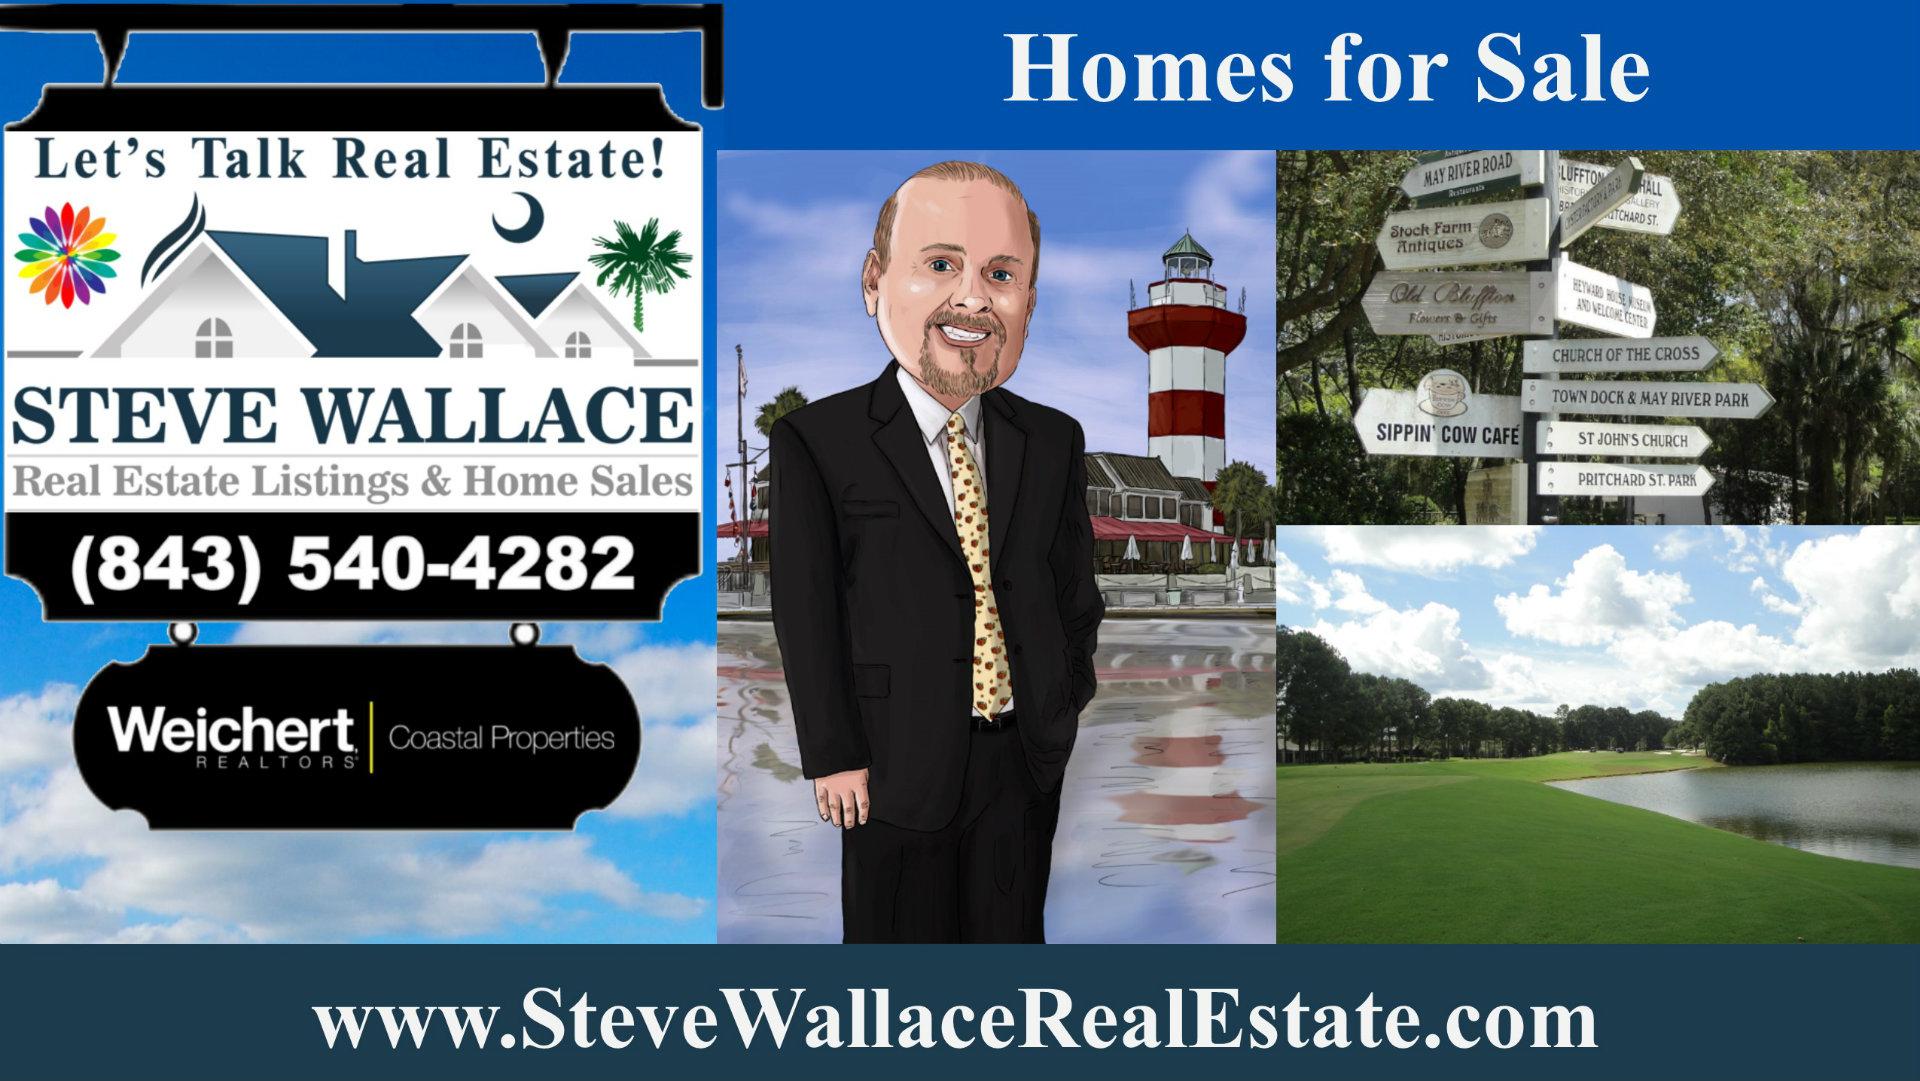 steve wallace sells bluffton, sun city, hilton head island, callawassie, okatie